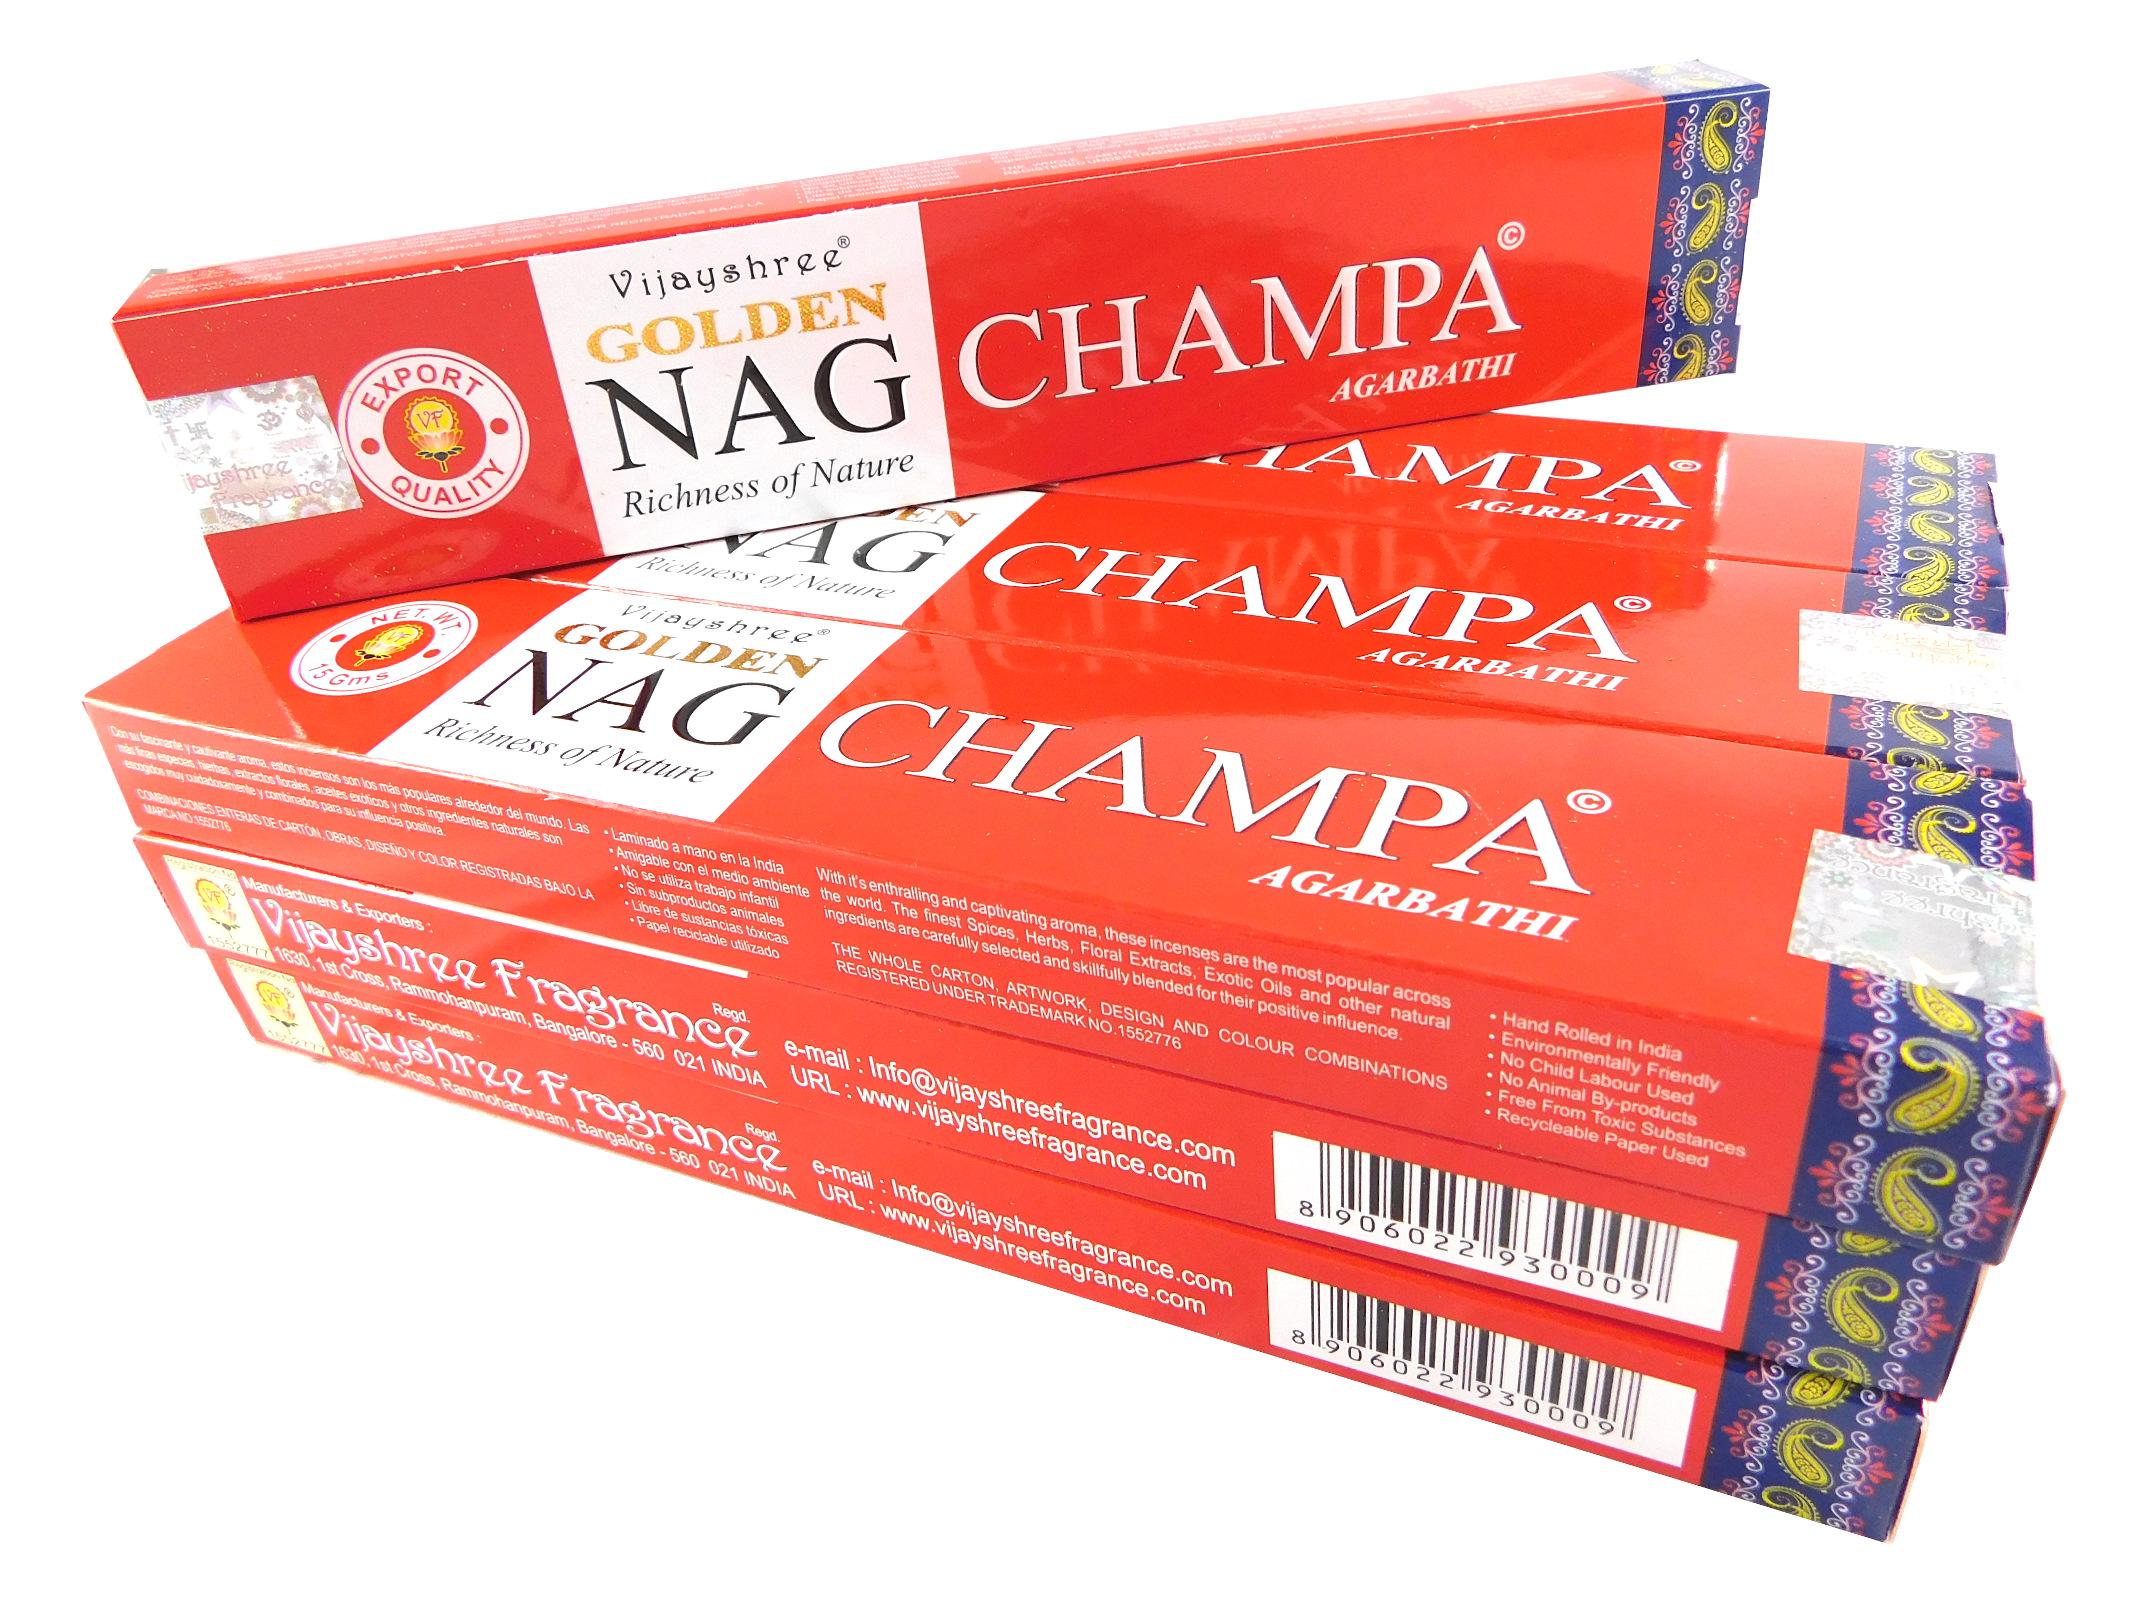 Vijayshree Räucherstäbchen Golden Nag Champa 12 Packs a 15g